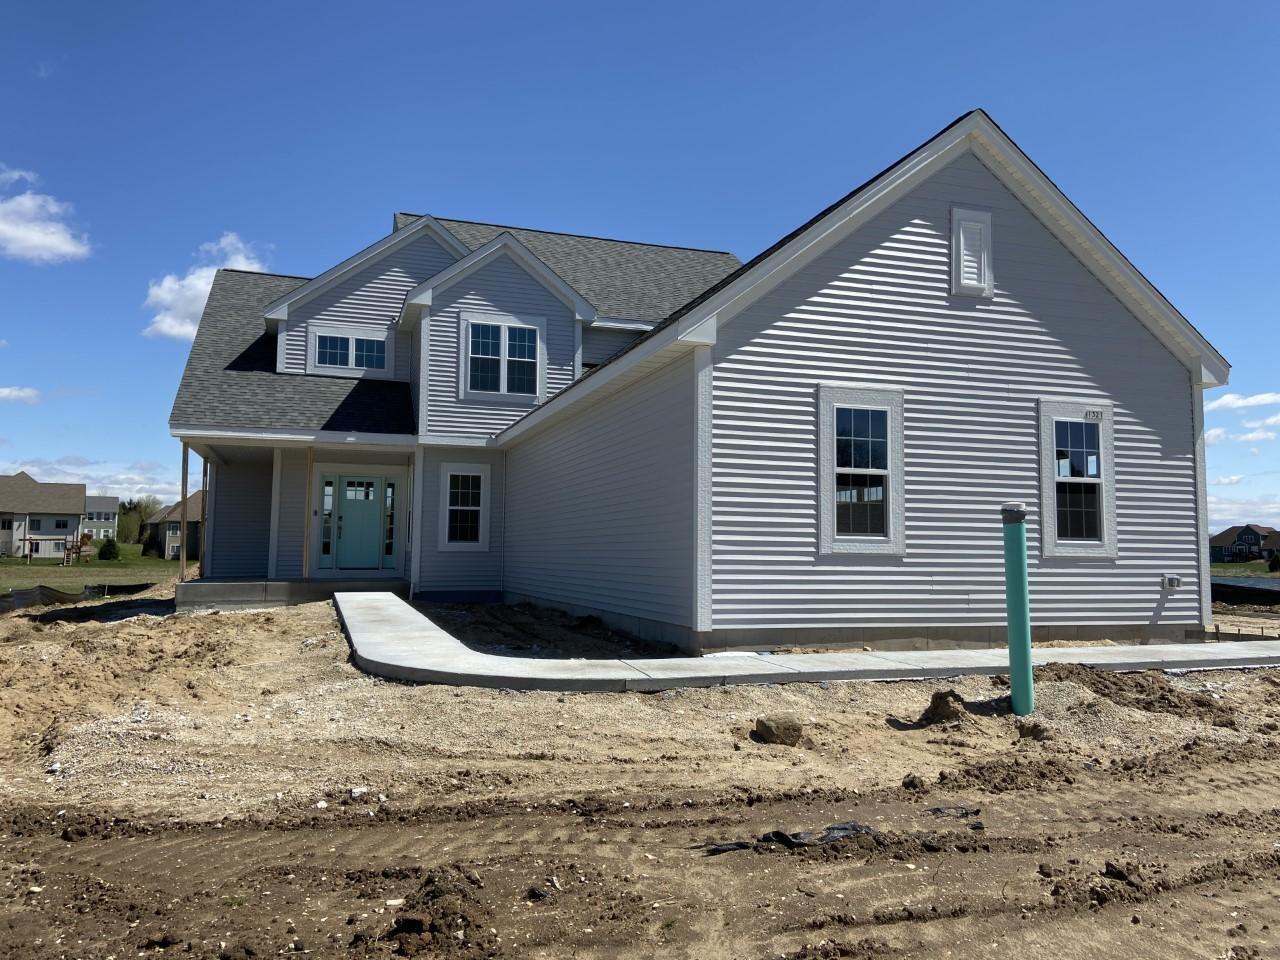 1321 Mamerow Ln W, Oconomowoc, Wisconsin 53066, 4 Bedrooms Bedrooms, ,2 BathroomsBathrooms,Single-Family,For Sale,Mamerow Ln W,1686770